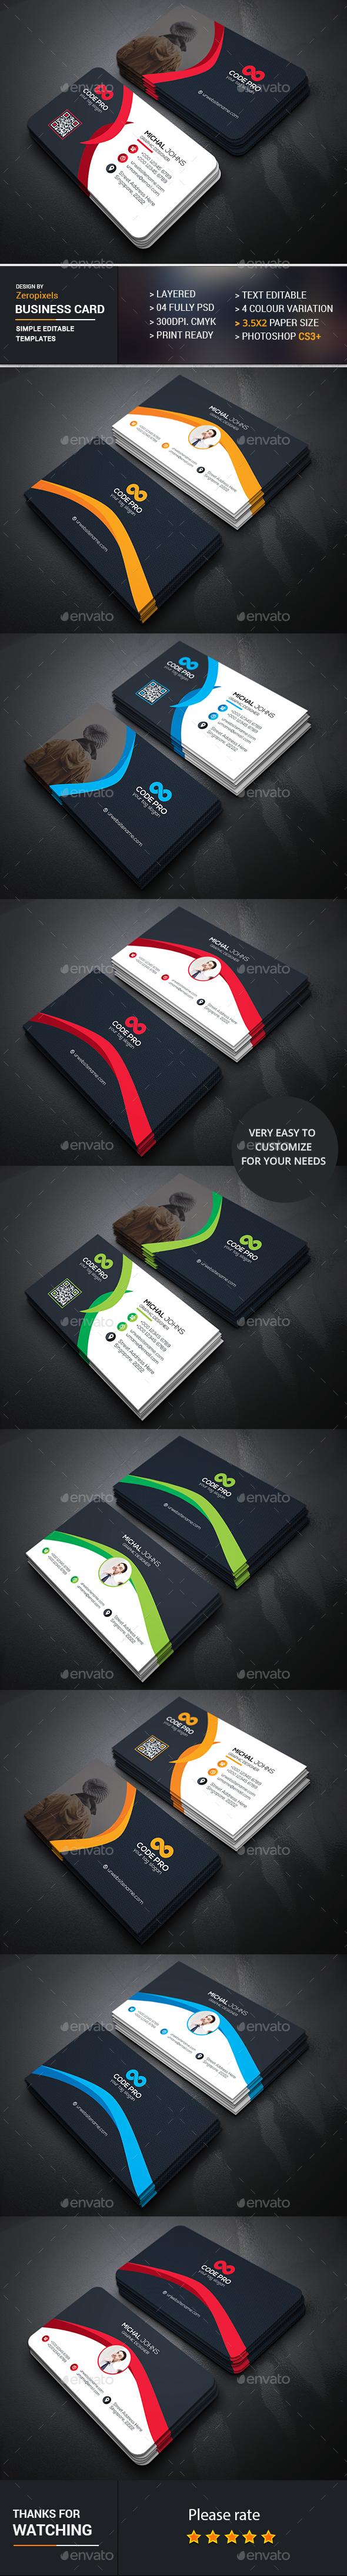 Business card design bundle business cards template psd download business card design bundle business cards template psd download here httpgraphicriveritembusiness card bundle16888806refyinkira reheart Choice Image